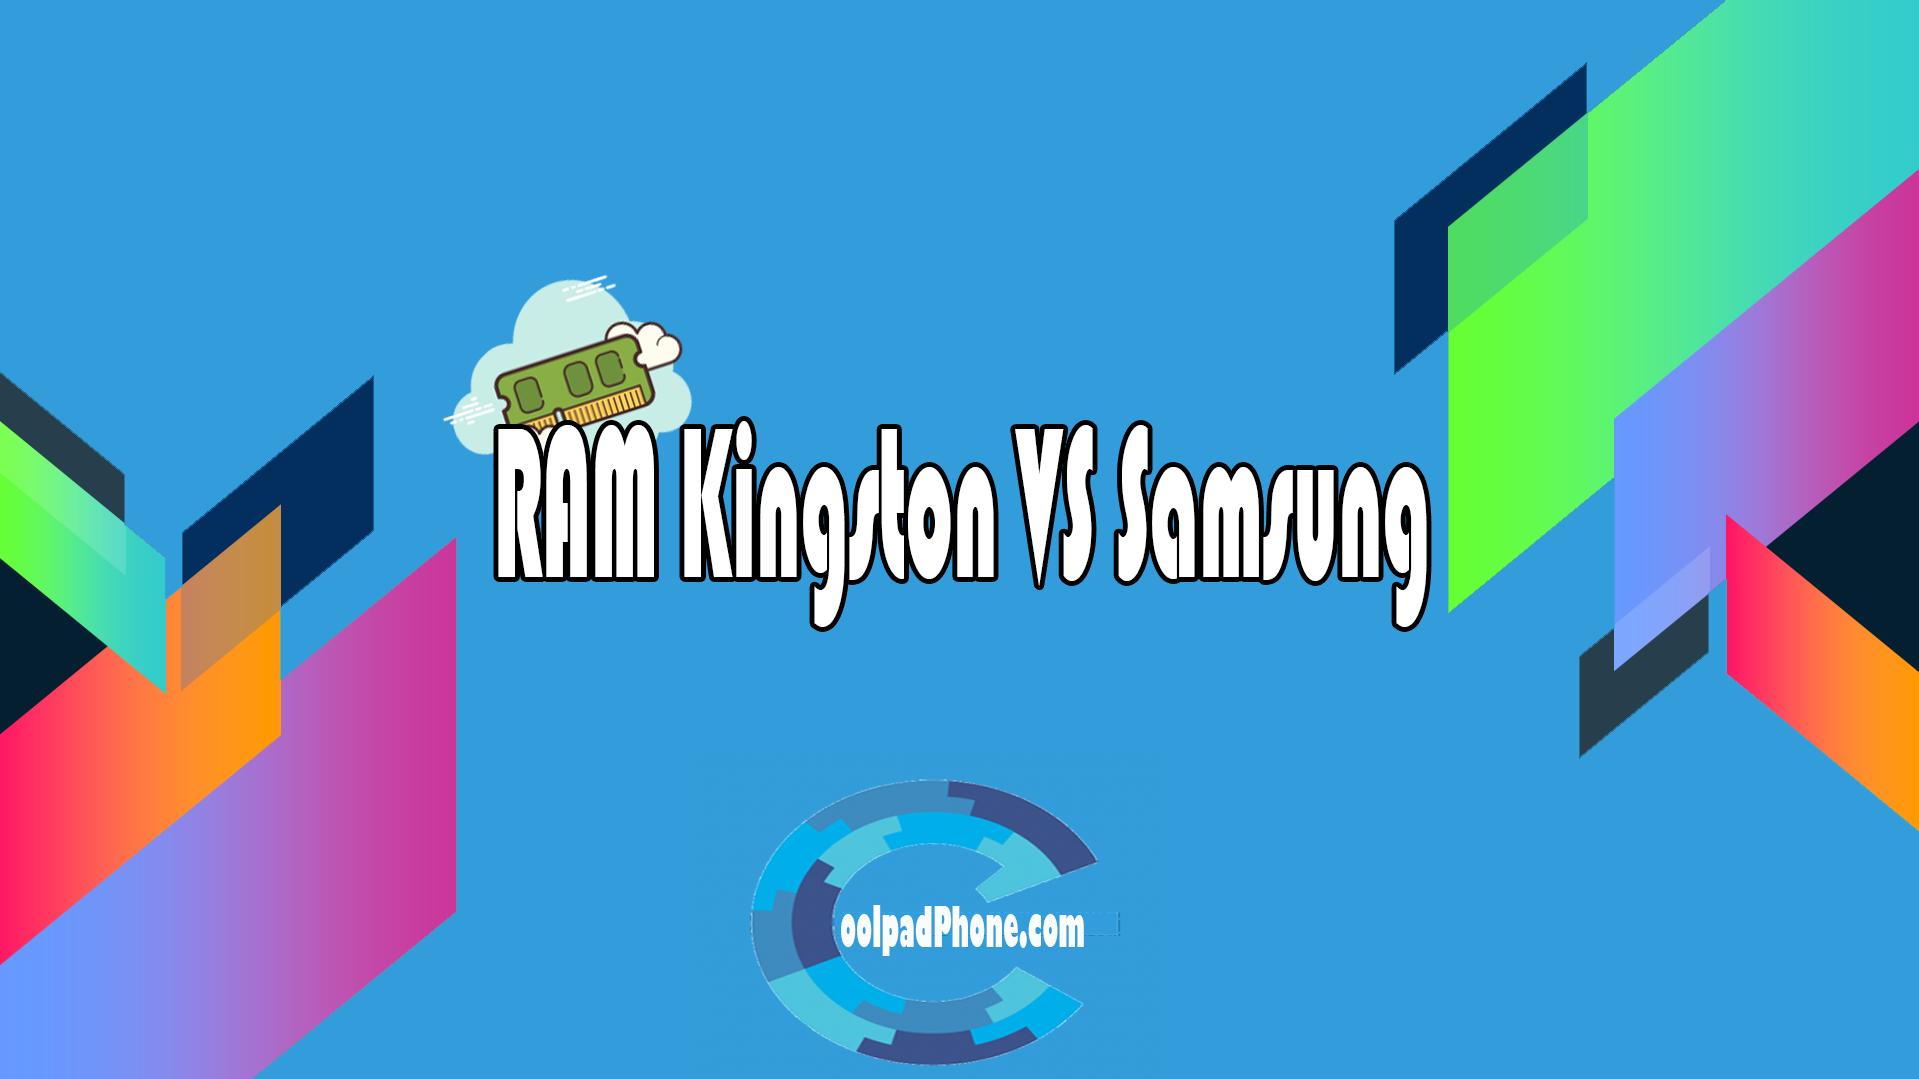 RAM Kingston VS Samsung